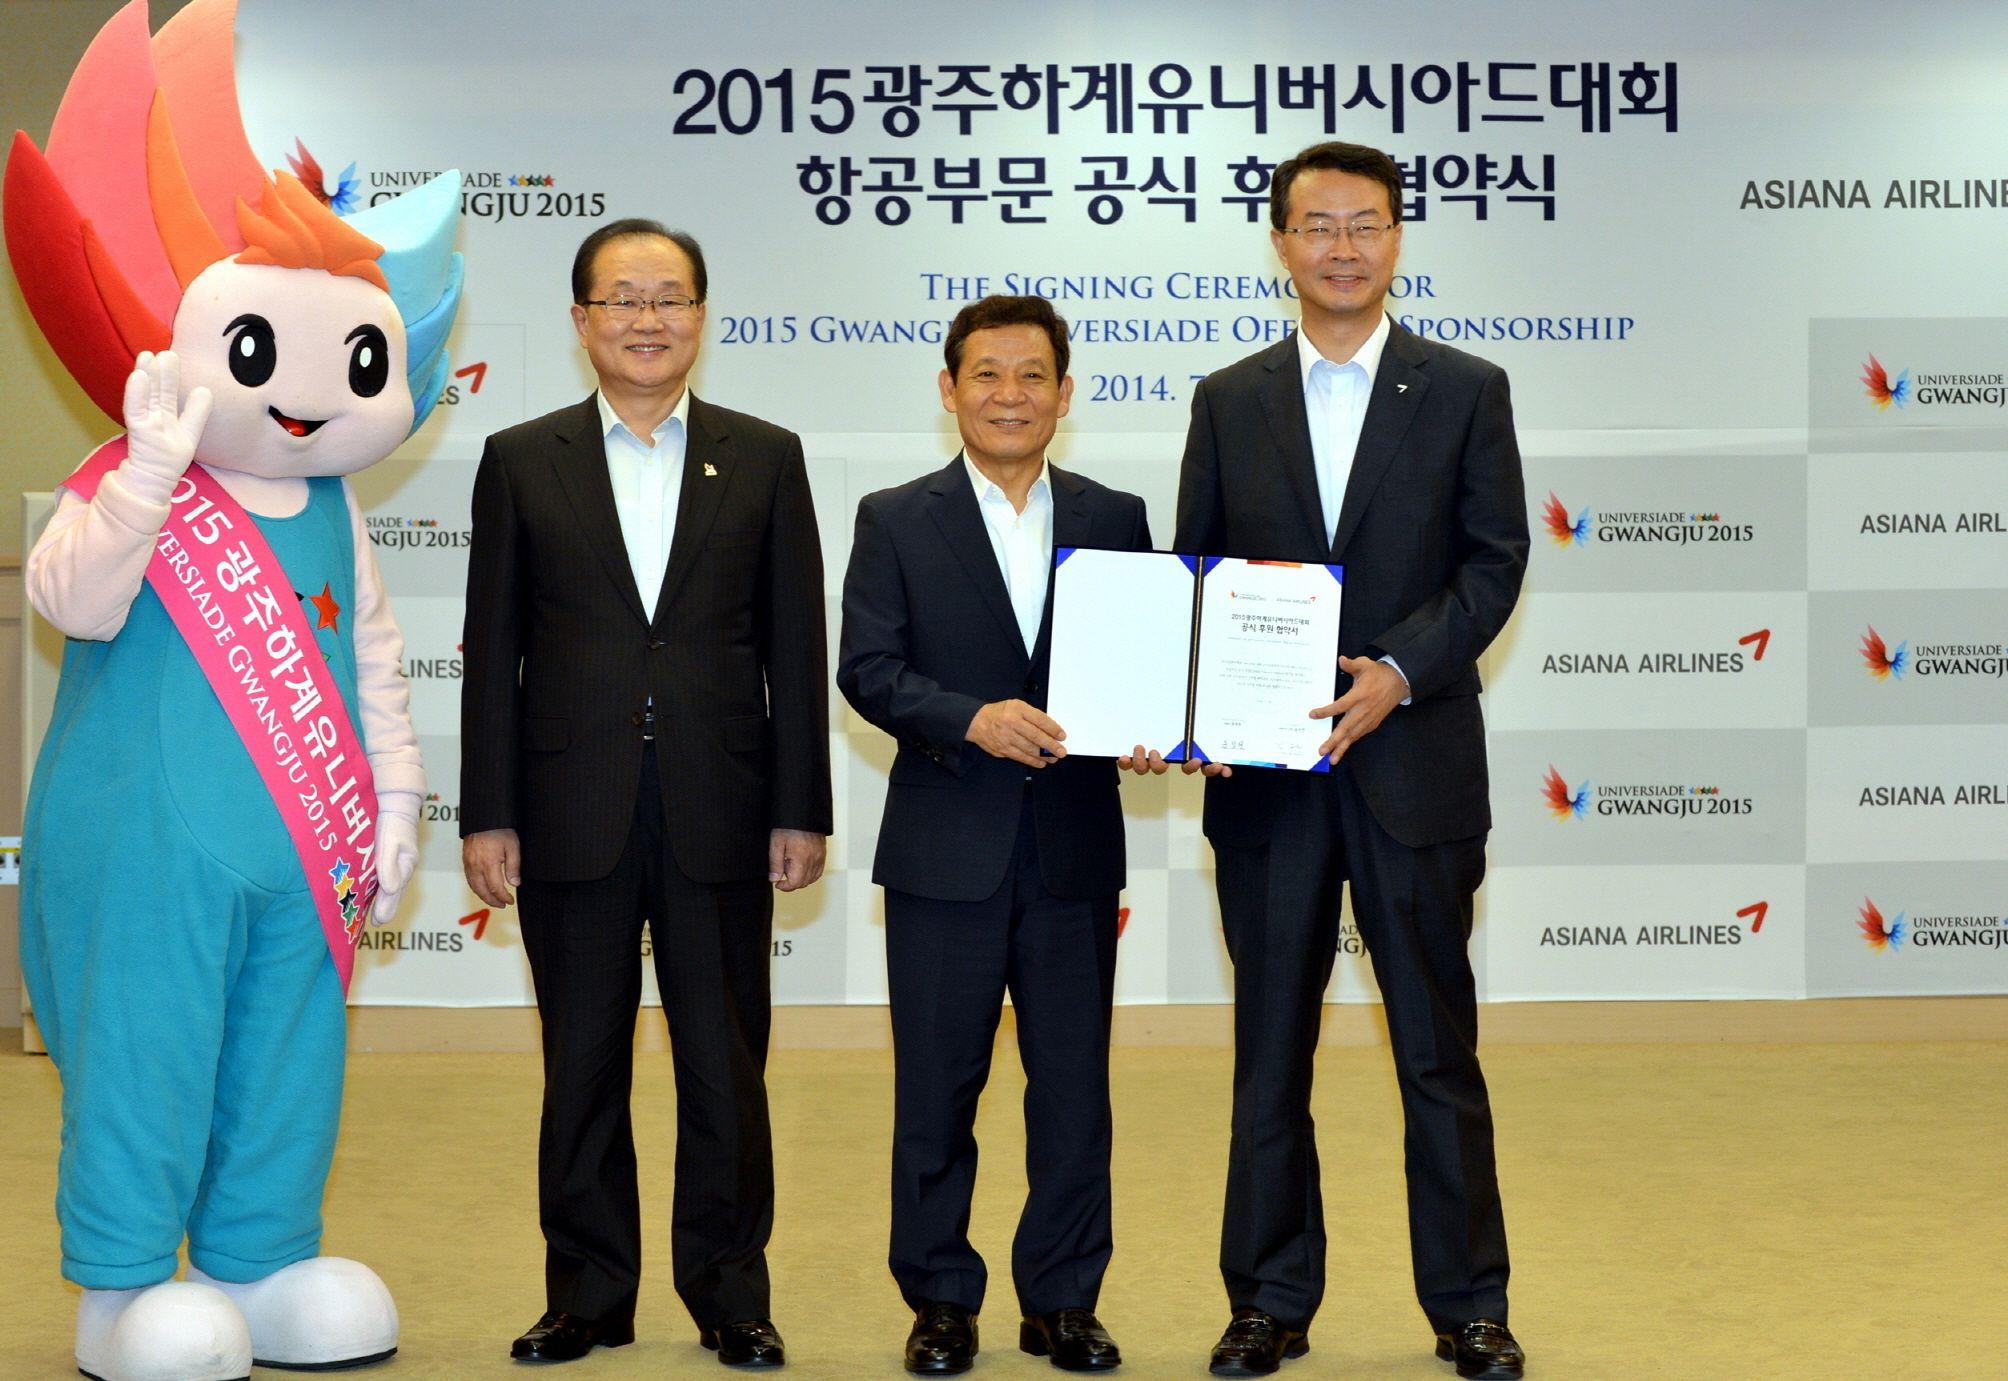 Kim Yoon-suk, Yoon Jang-hyun and Kim Soo-cheon at the official Gwangju 2015 and Asiana Airlines sponsorship agreement ceremony ©Gwangju 2015